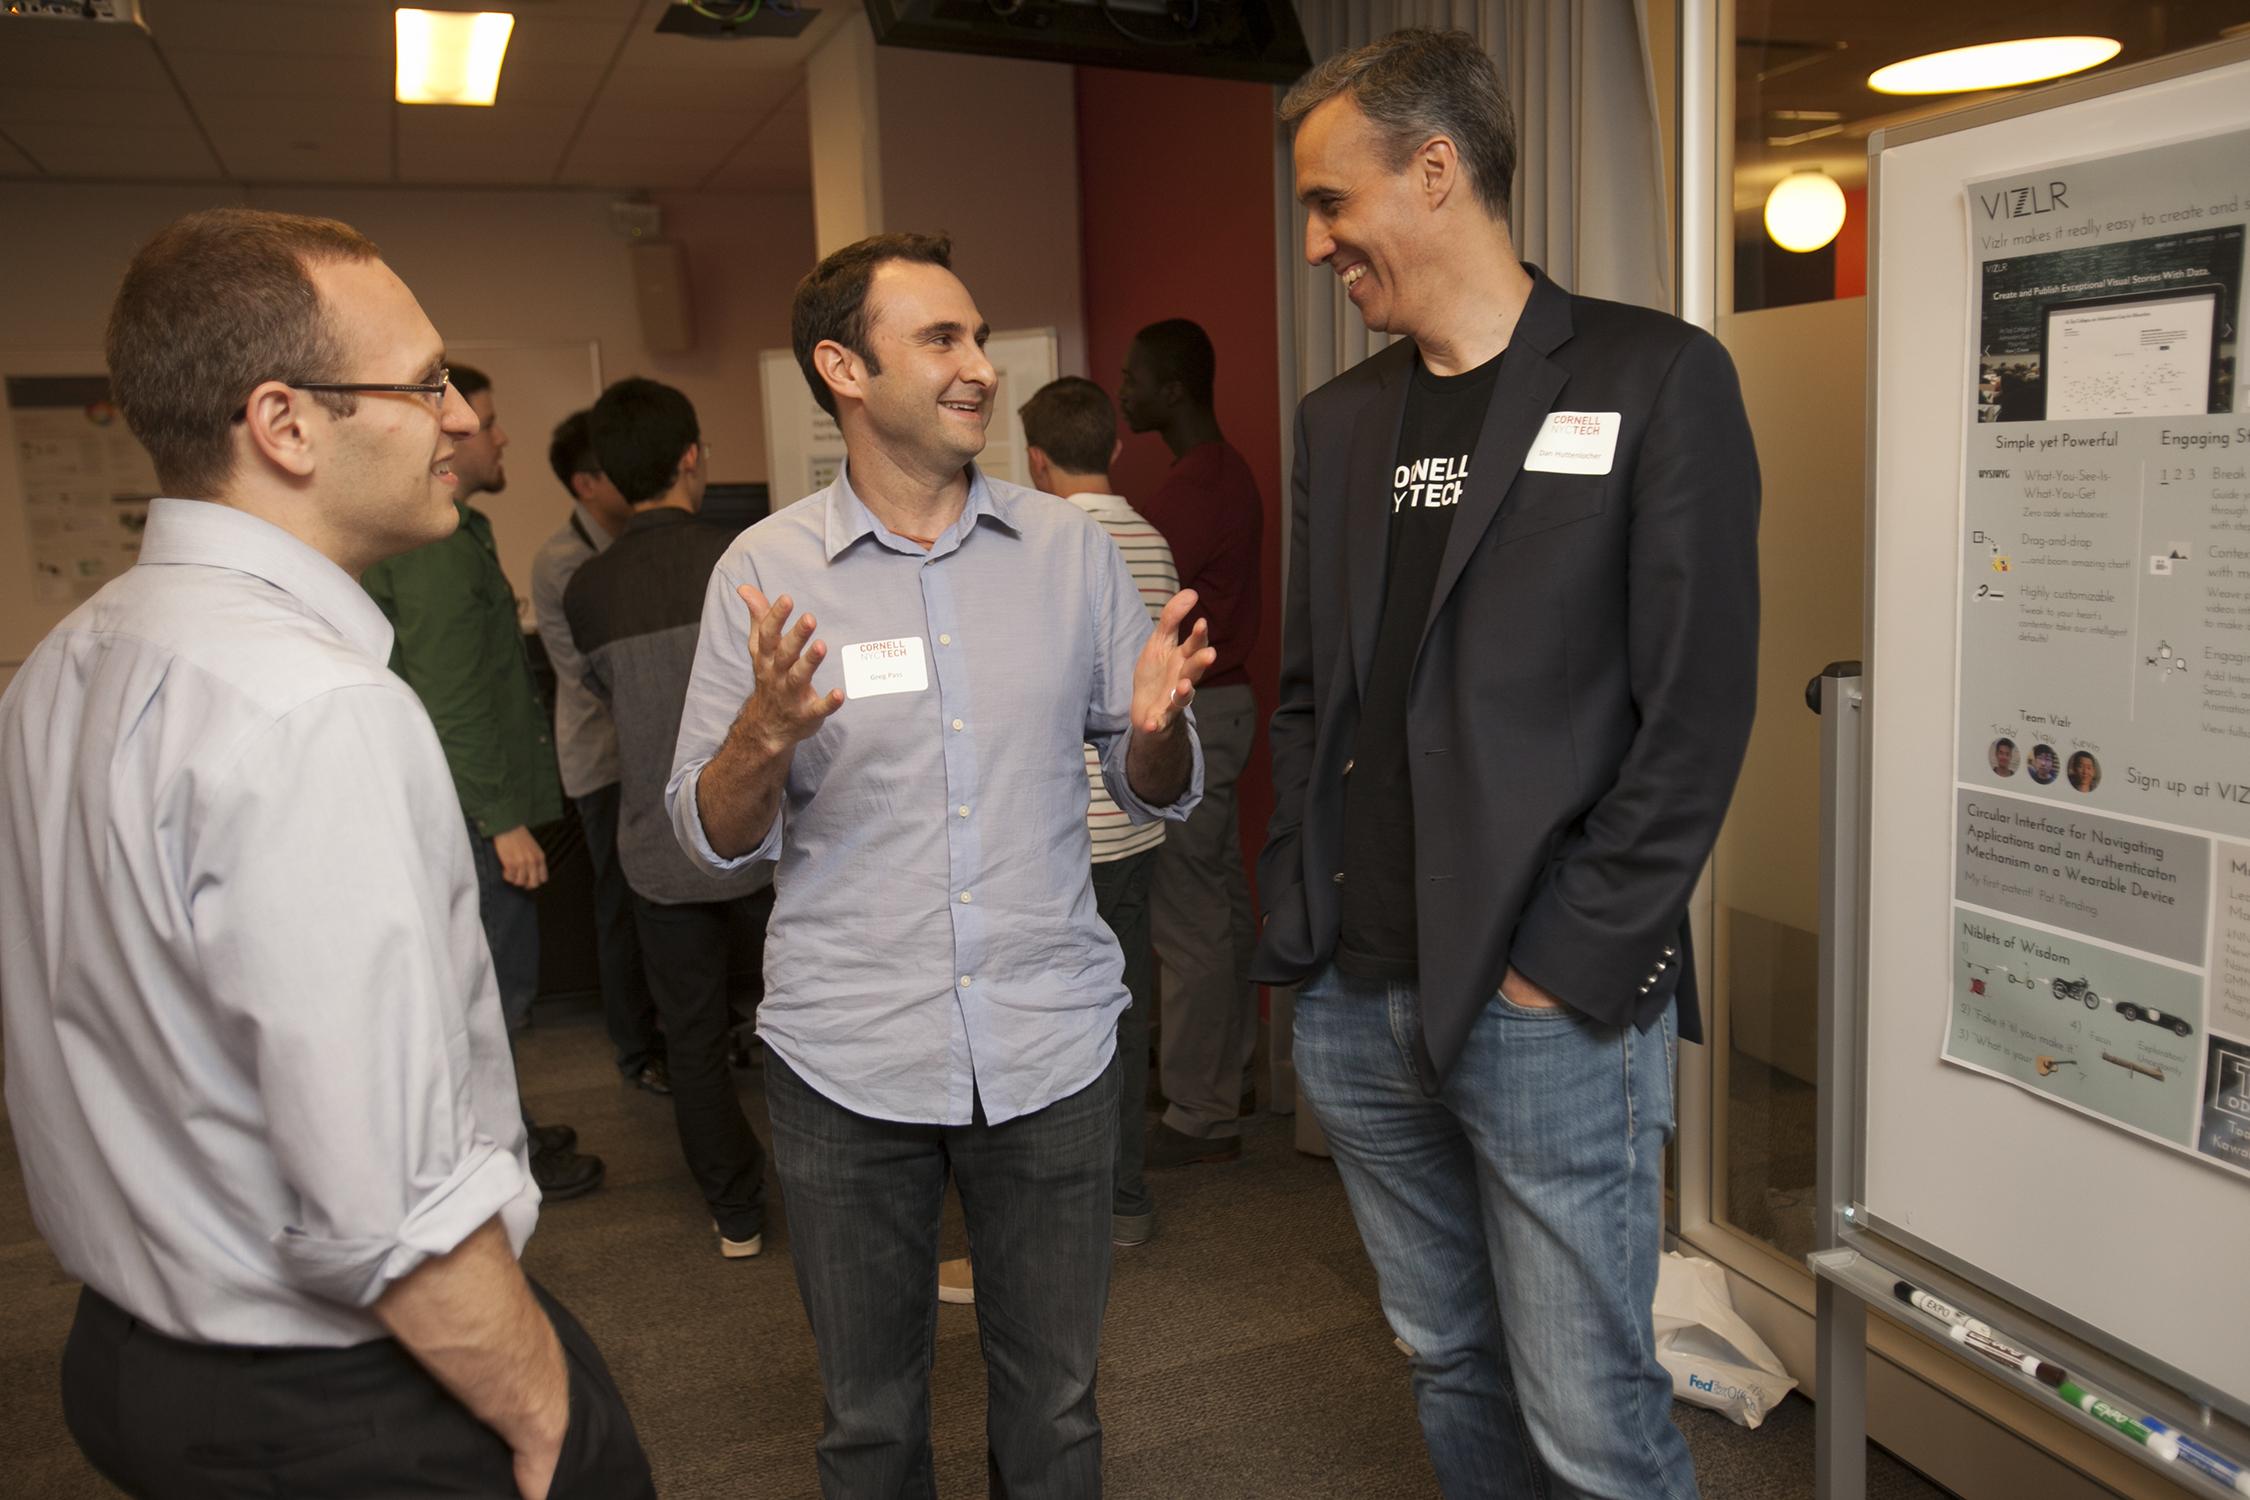 3 men smiling while having a conversation